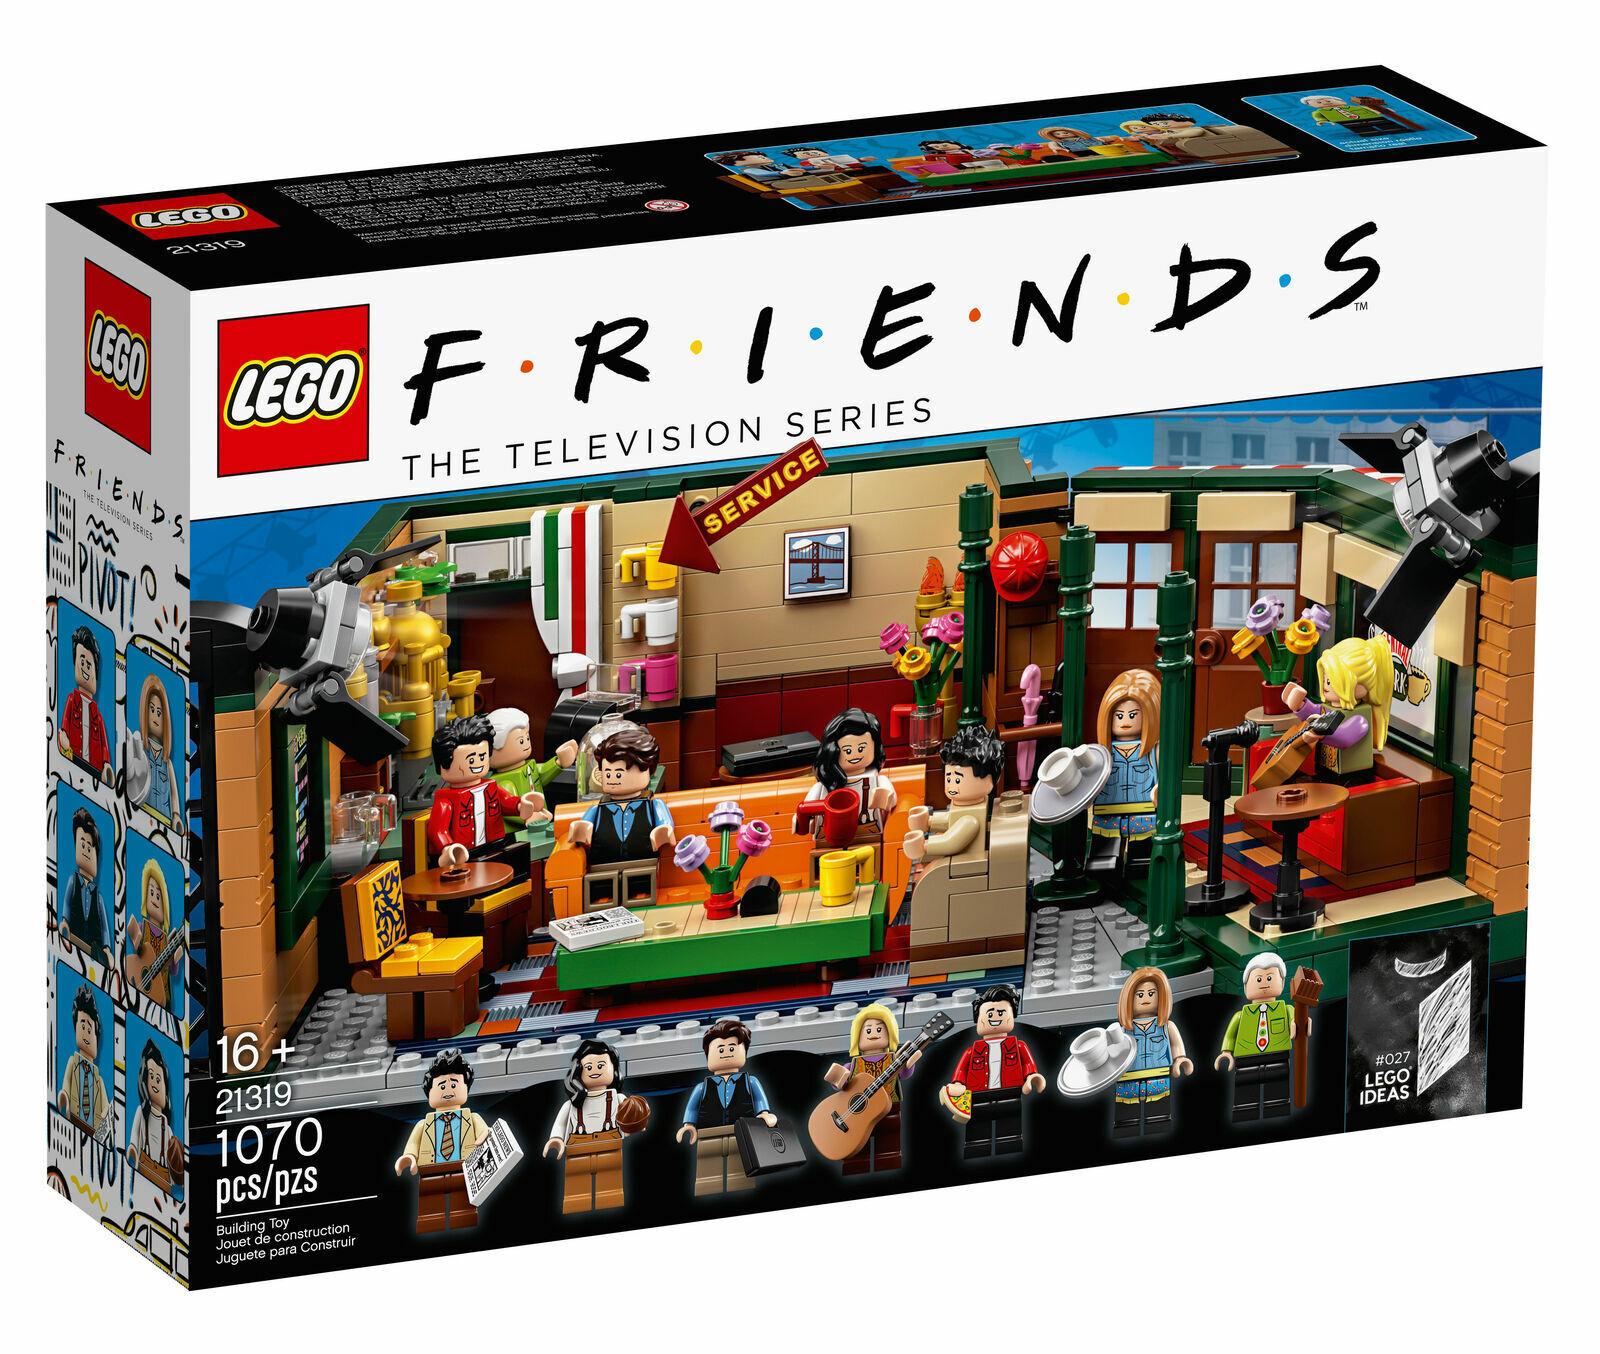 LEGO   FRIENDS serie TV poteva centrale (21319)  prezzi bassissimi